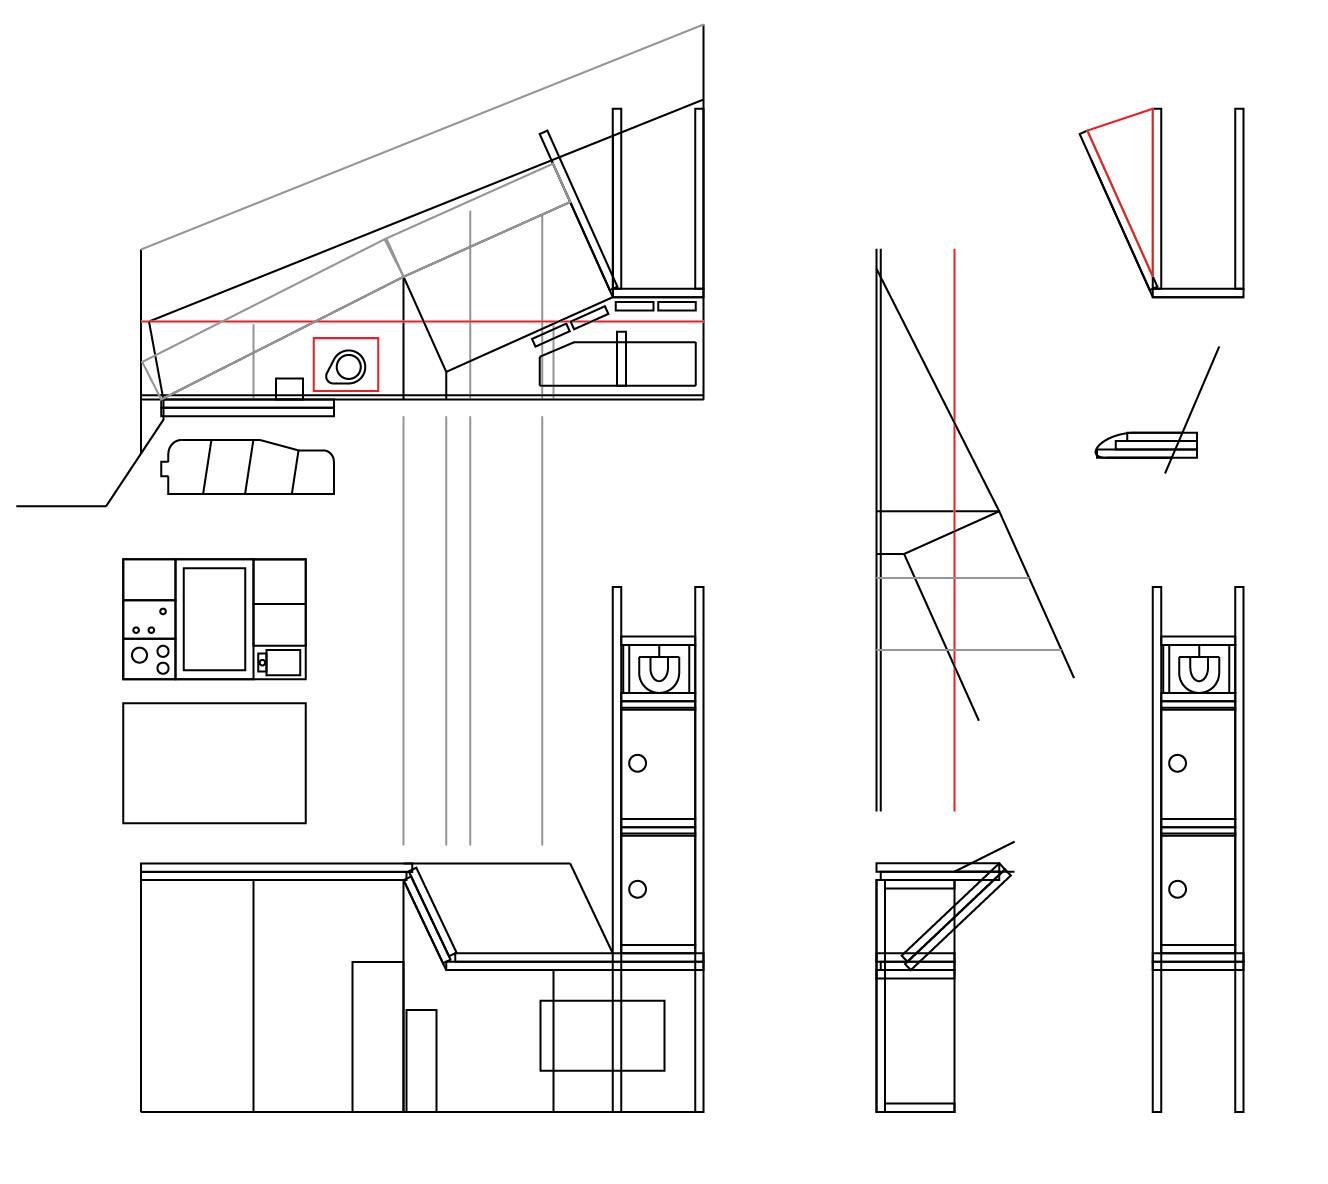 Cabin - cockpit - drawings 4.jpg